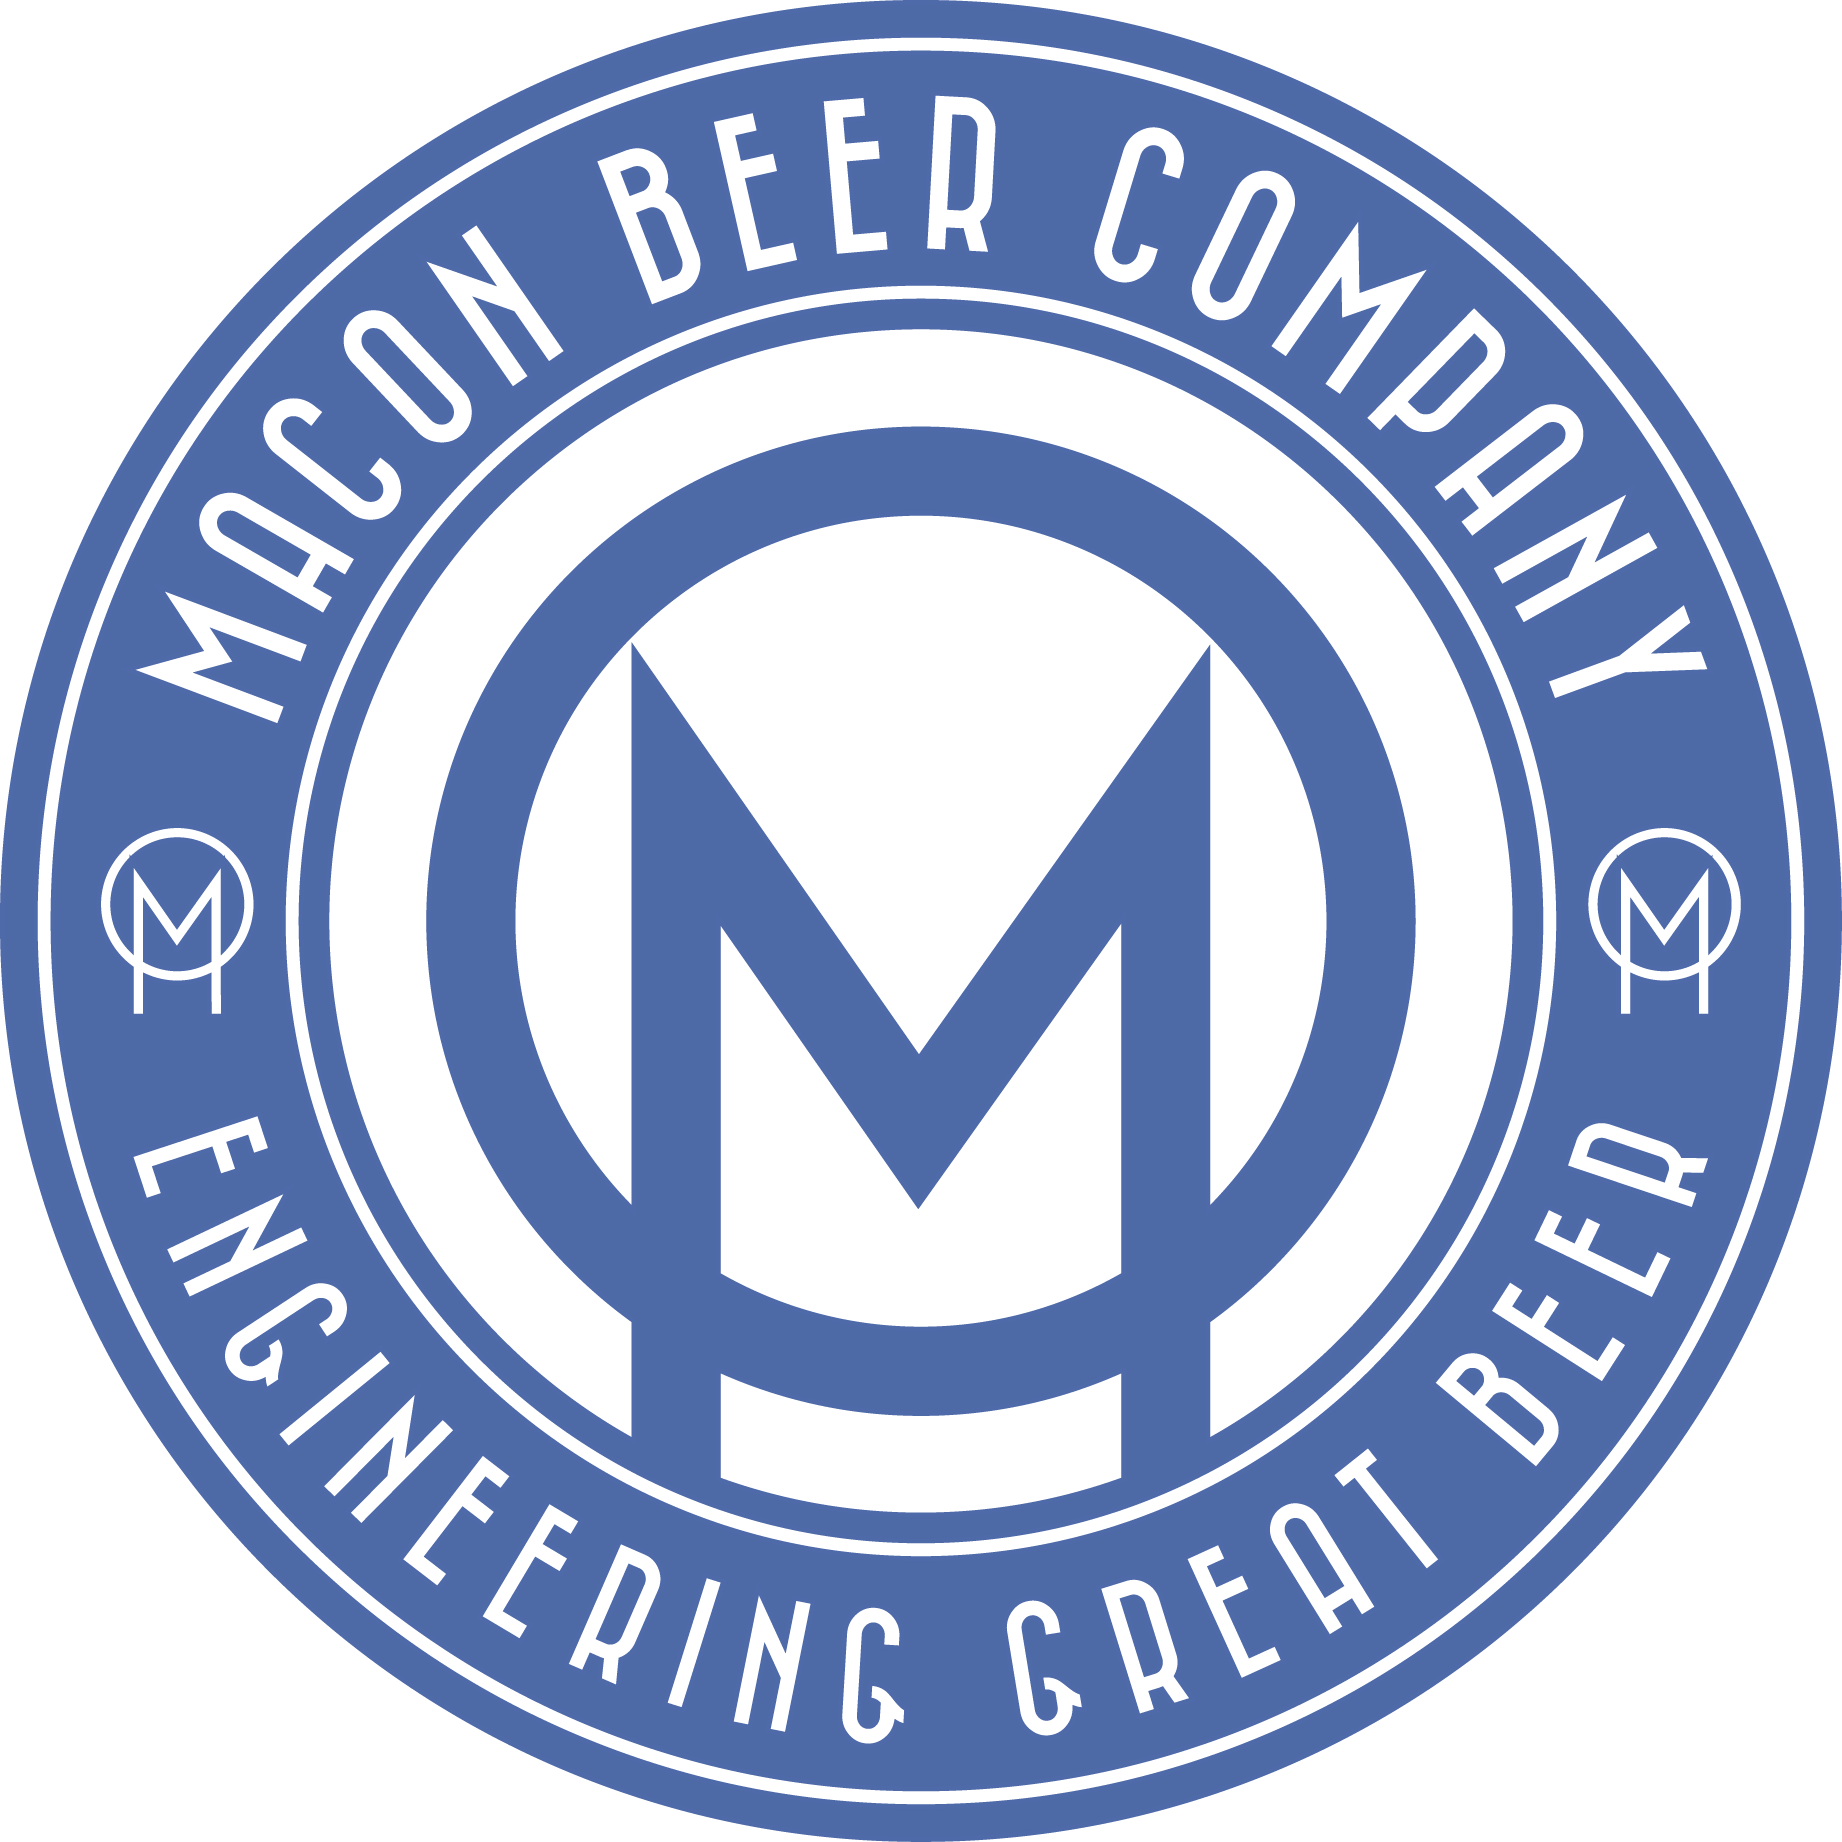 macon beer co.png